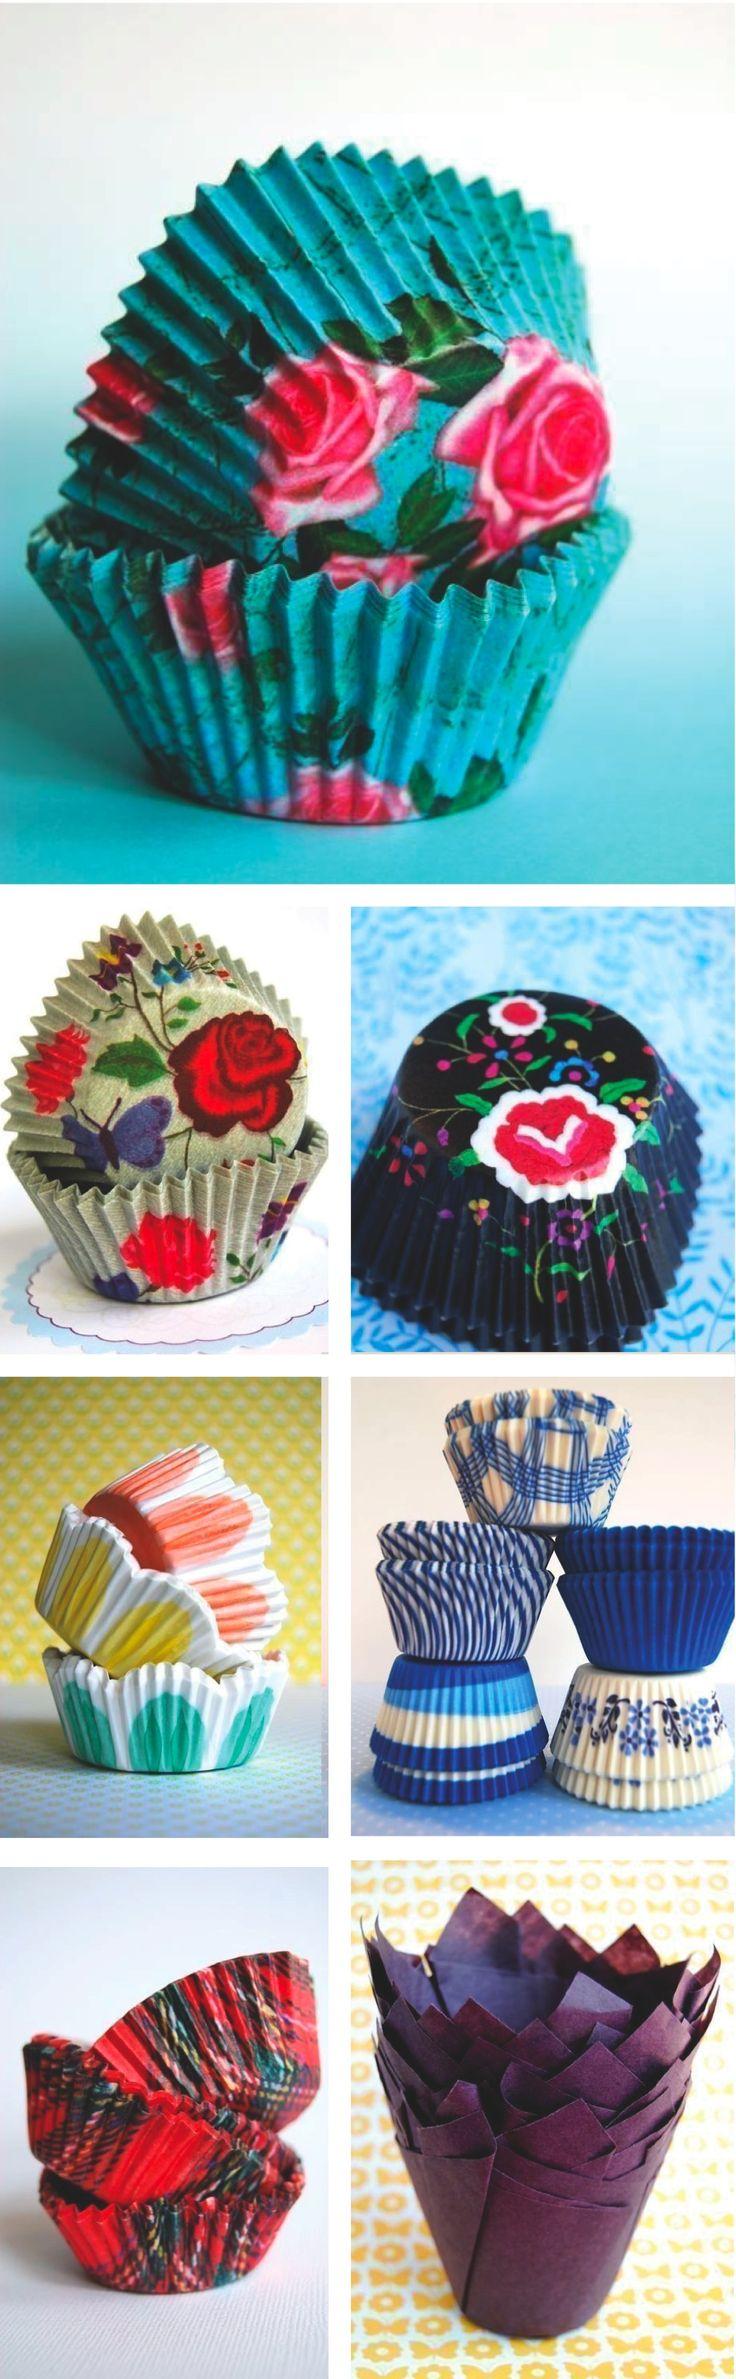 Beautiful cupcake holders